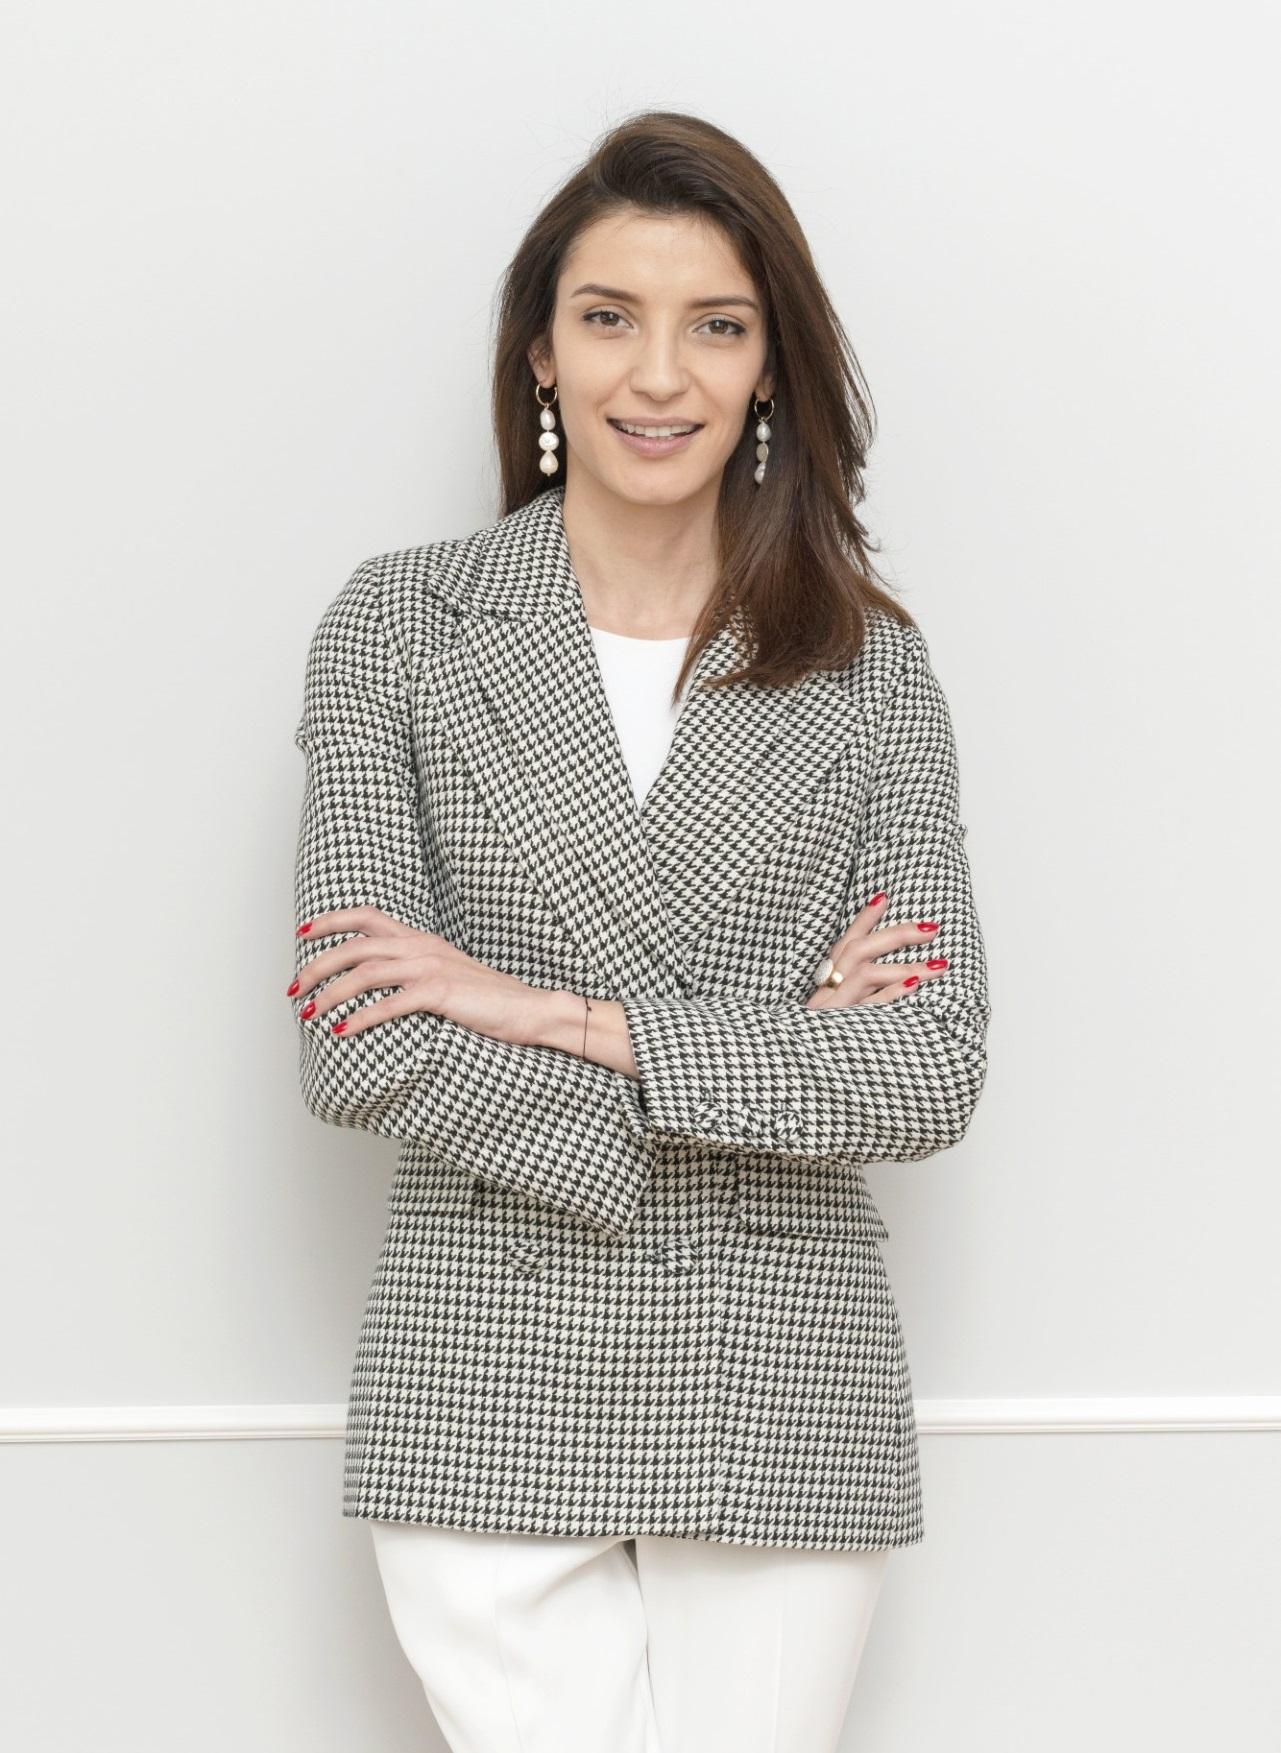 Aleksandra Nanish